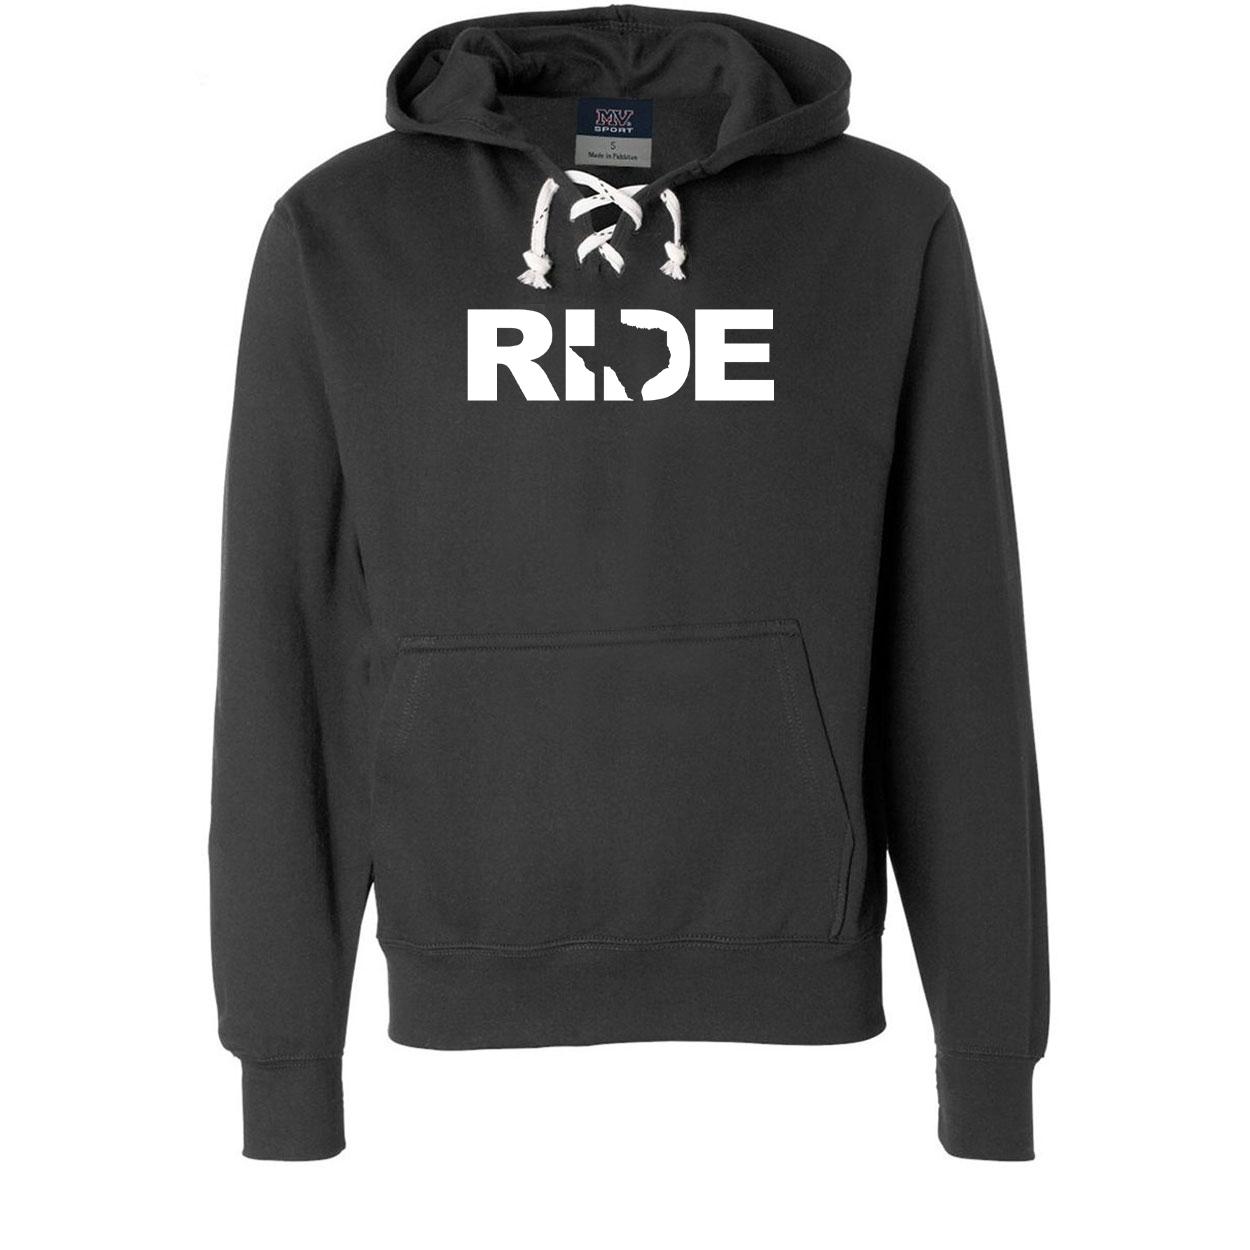 Ride Texas Classic Unisex Premium Hockey Sweatshirt Black (White Logo)